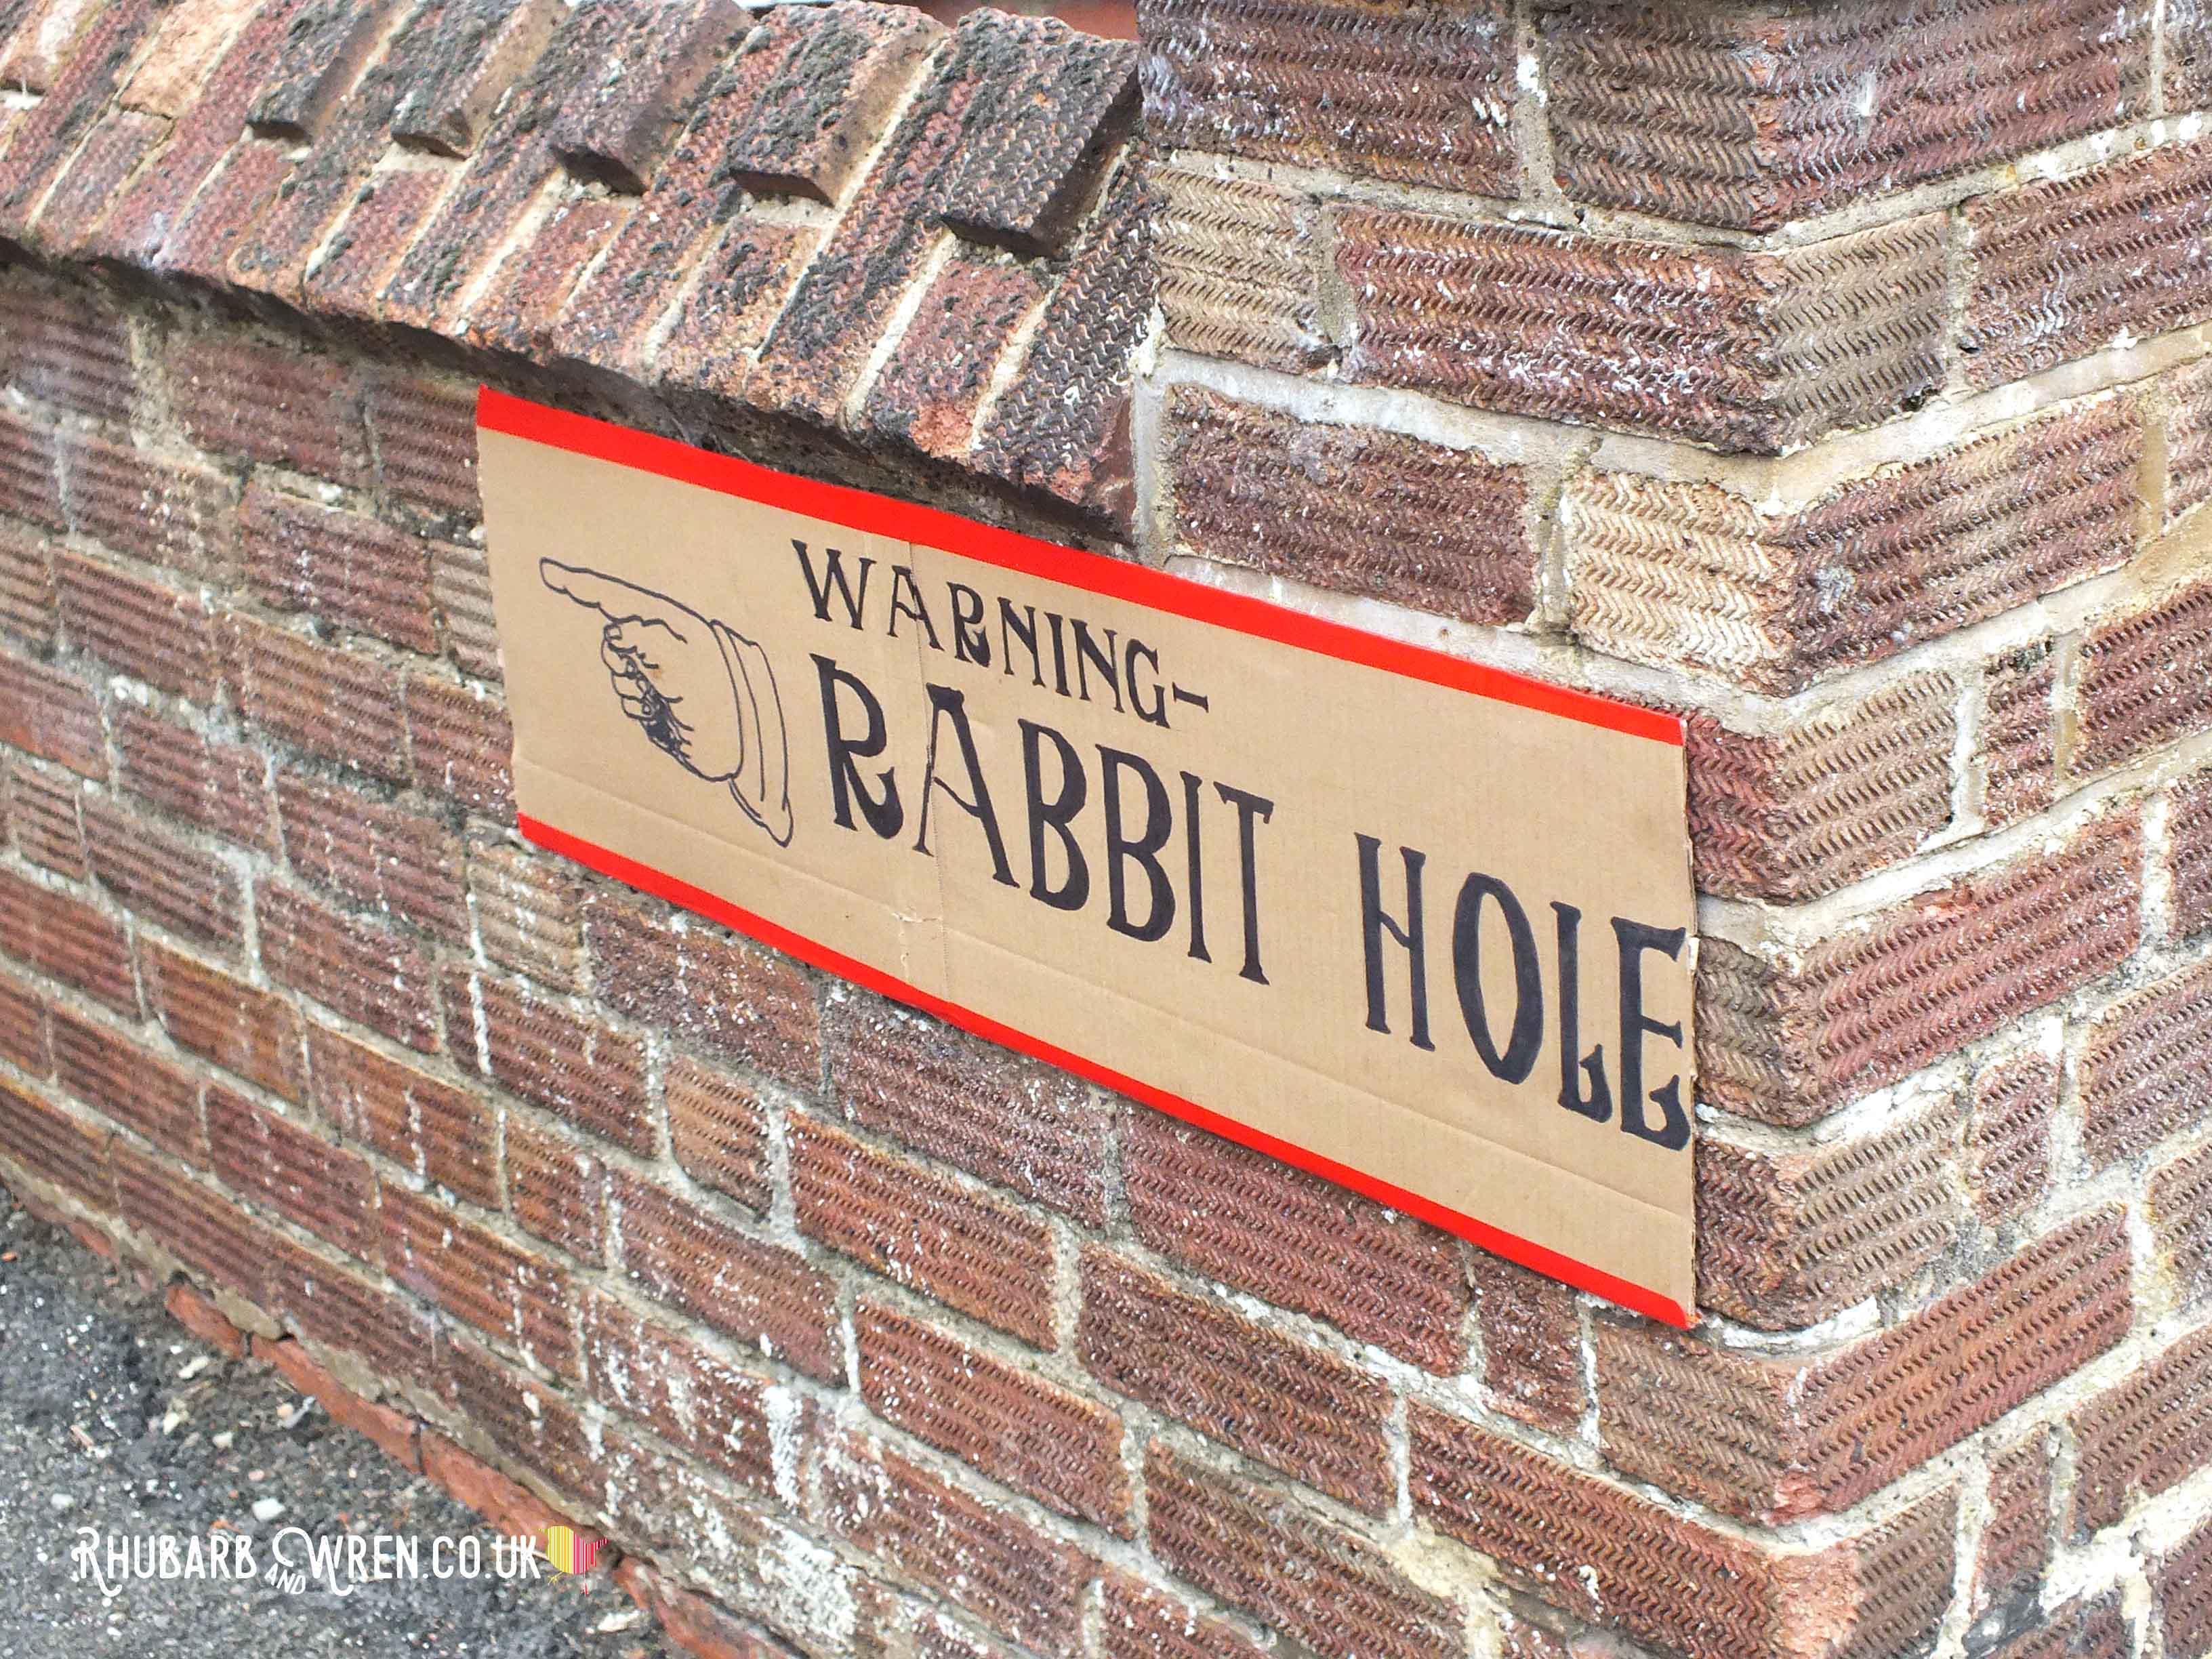 alice_in_wonderland_rabbit_hole_sign